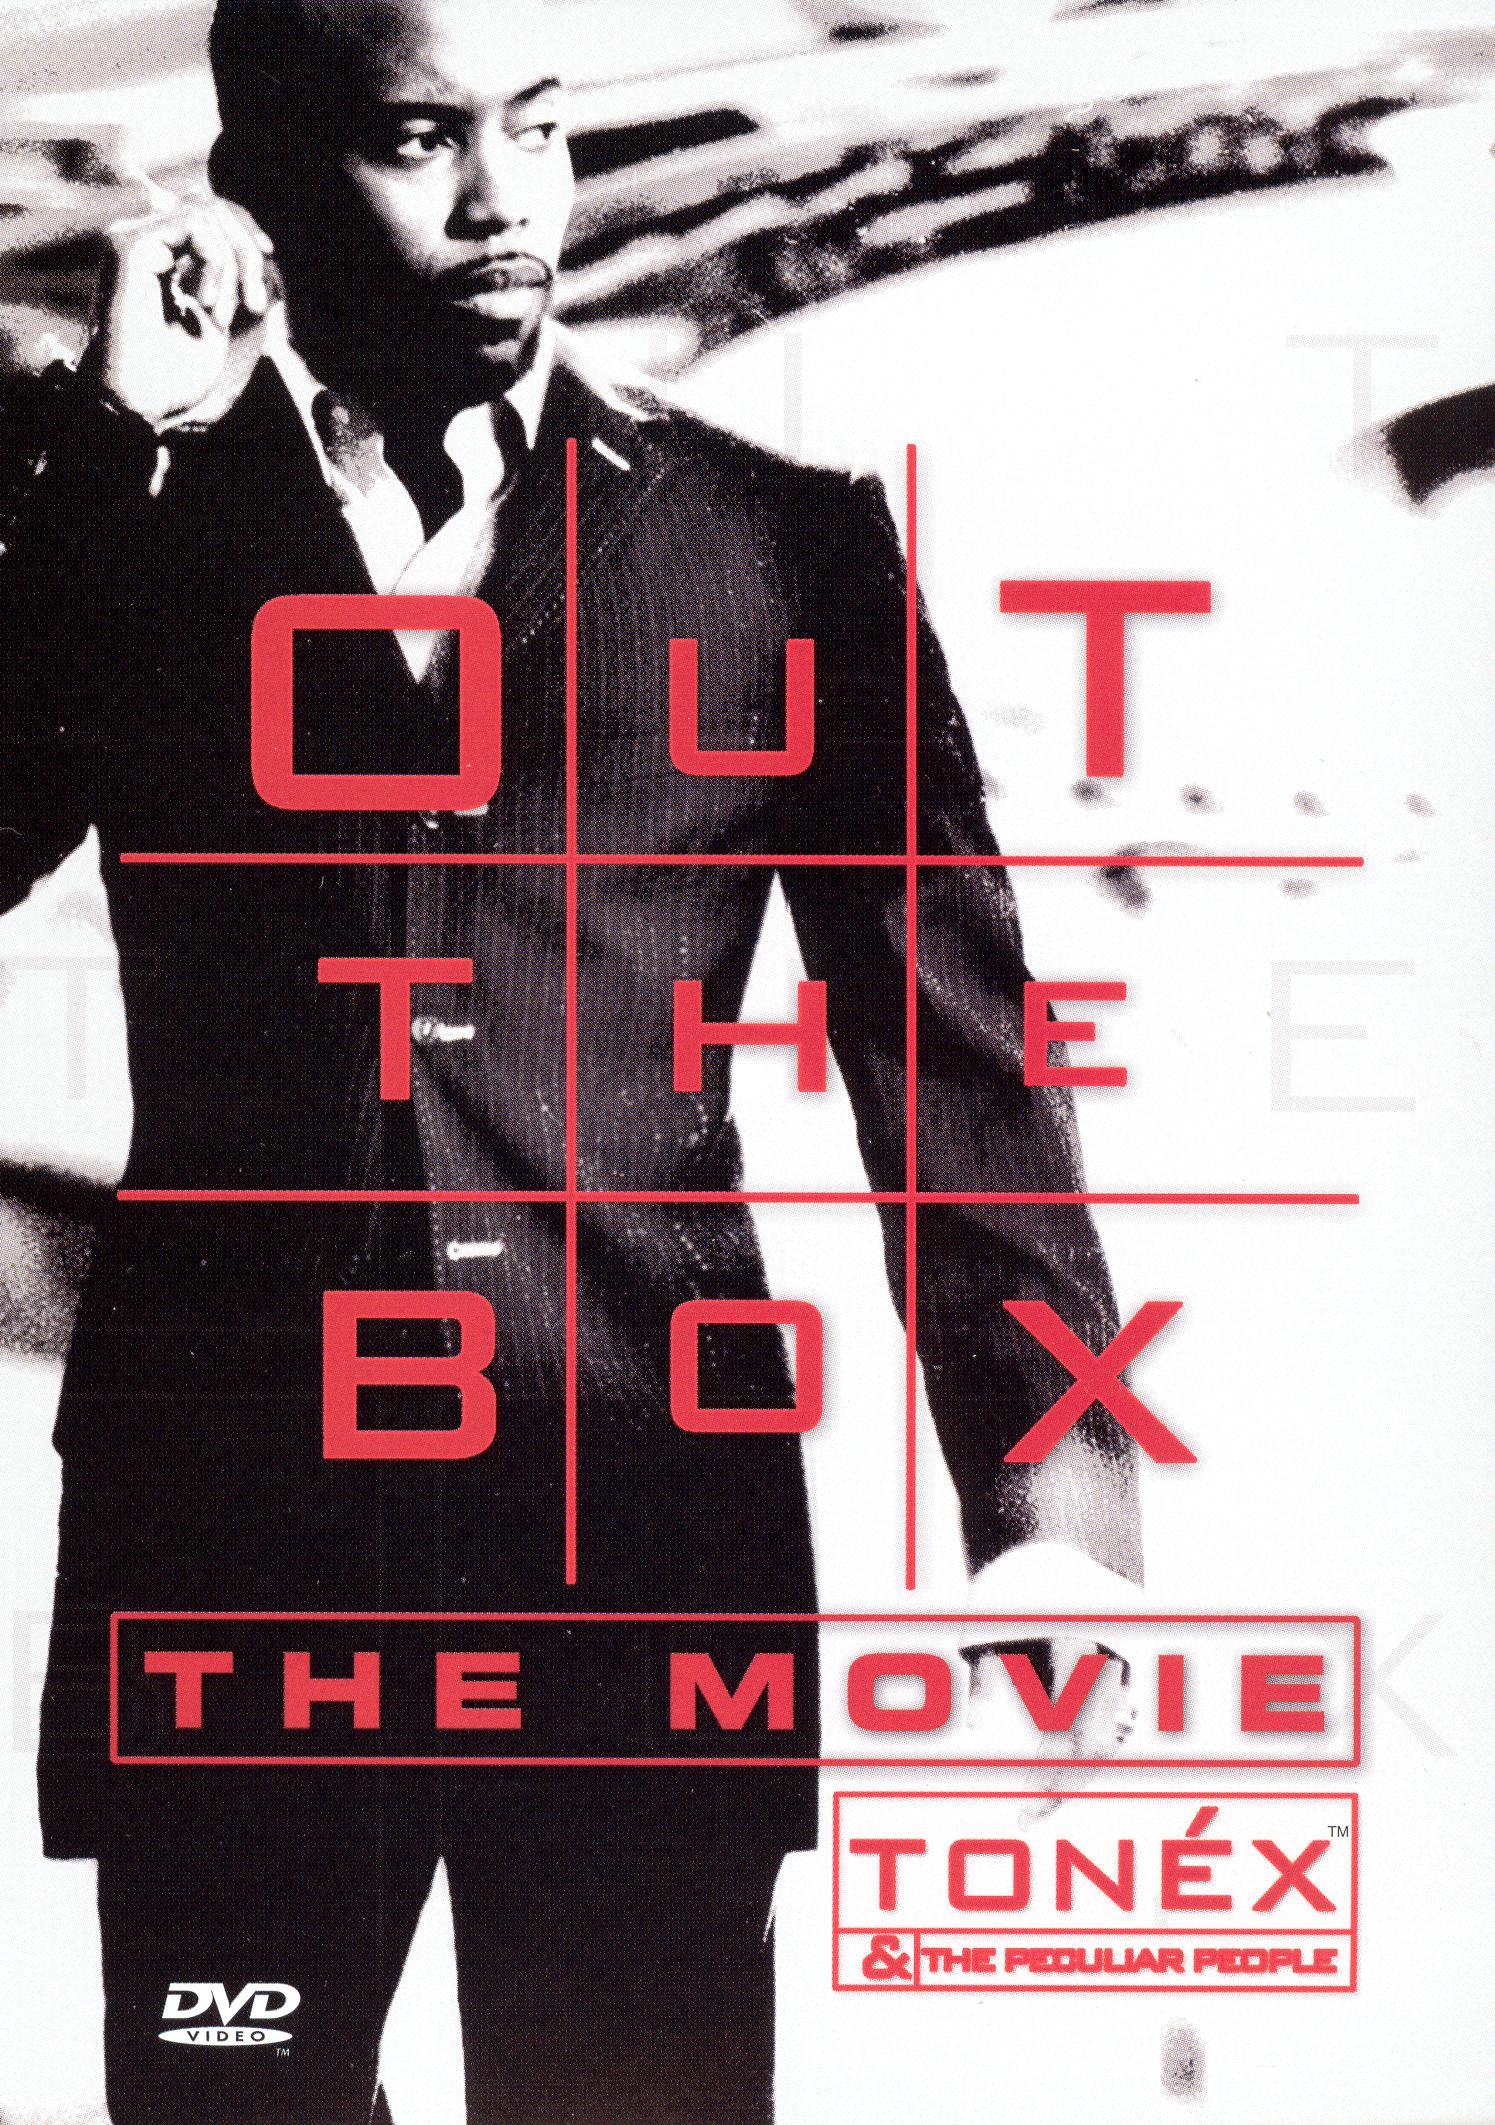 Tonex: Out the Box